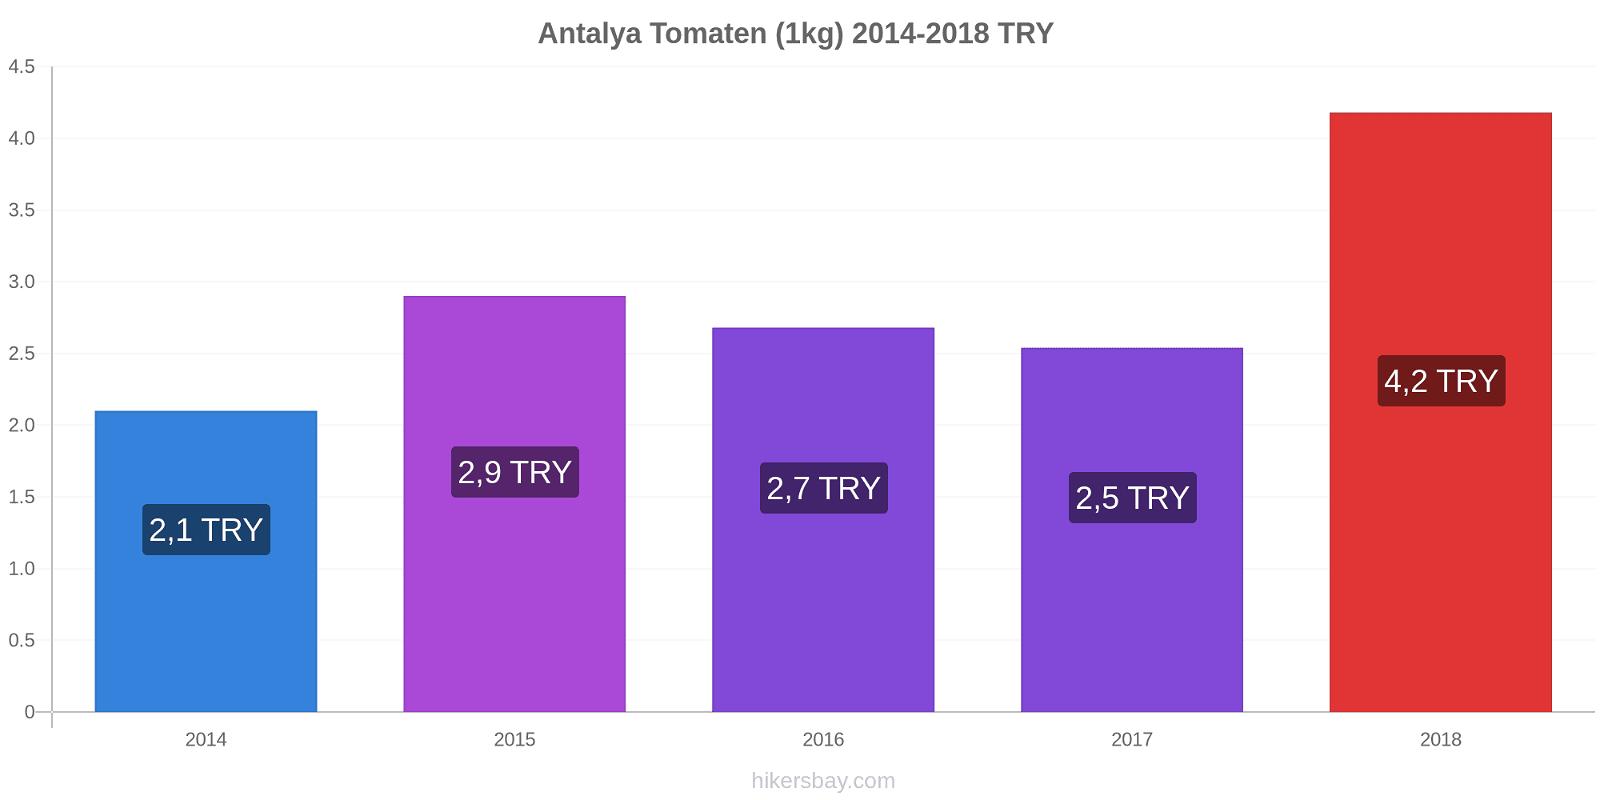 Antalya Preisänderungen Tomaten (1kg) hikersbay.com